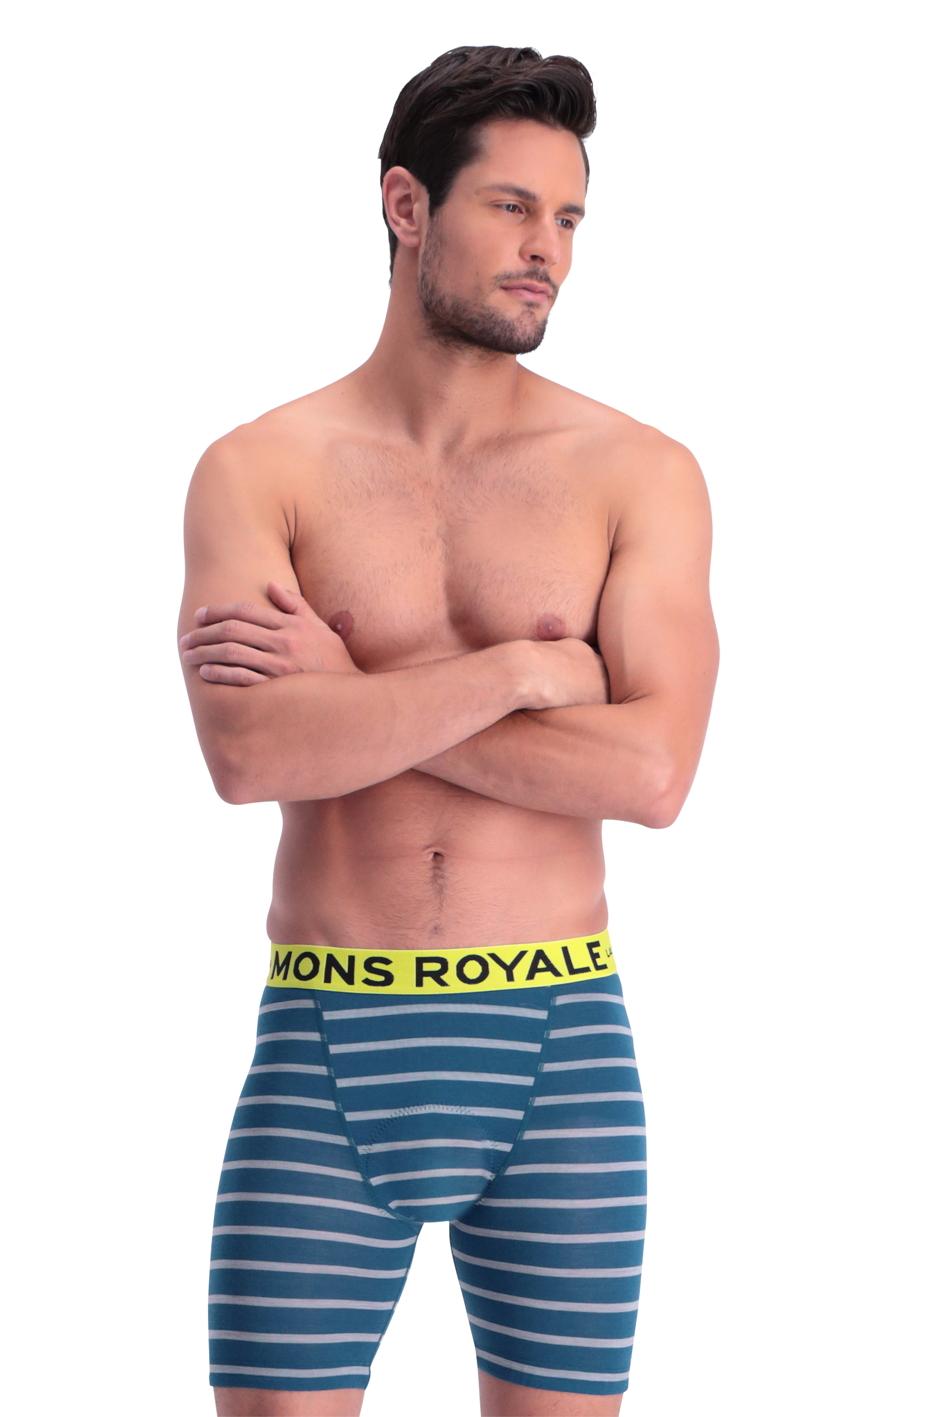 Mons Royal Sommerkollektion 2019